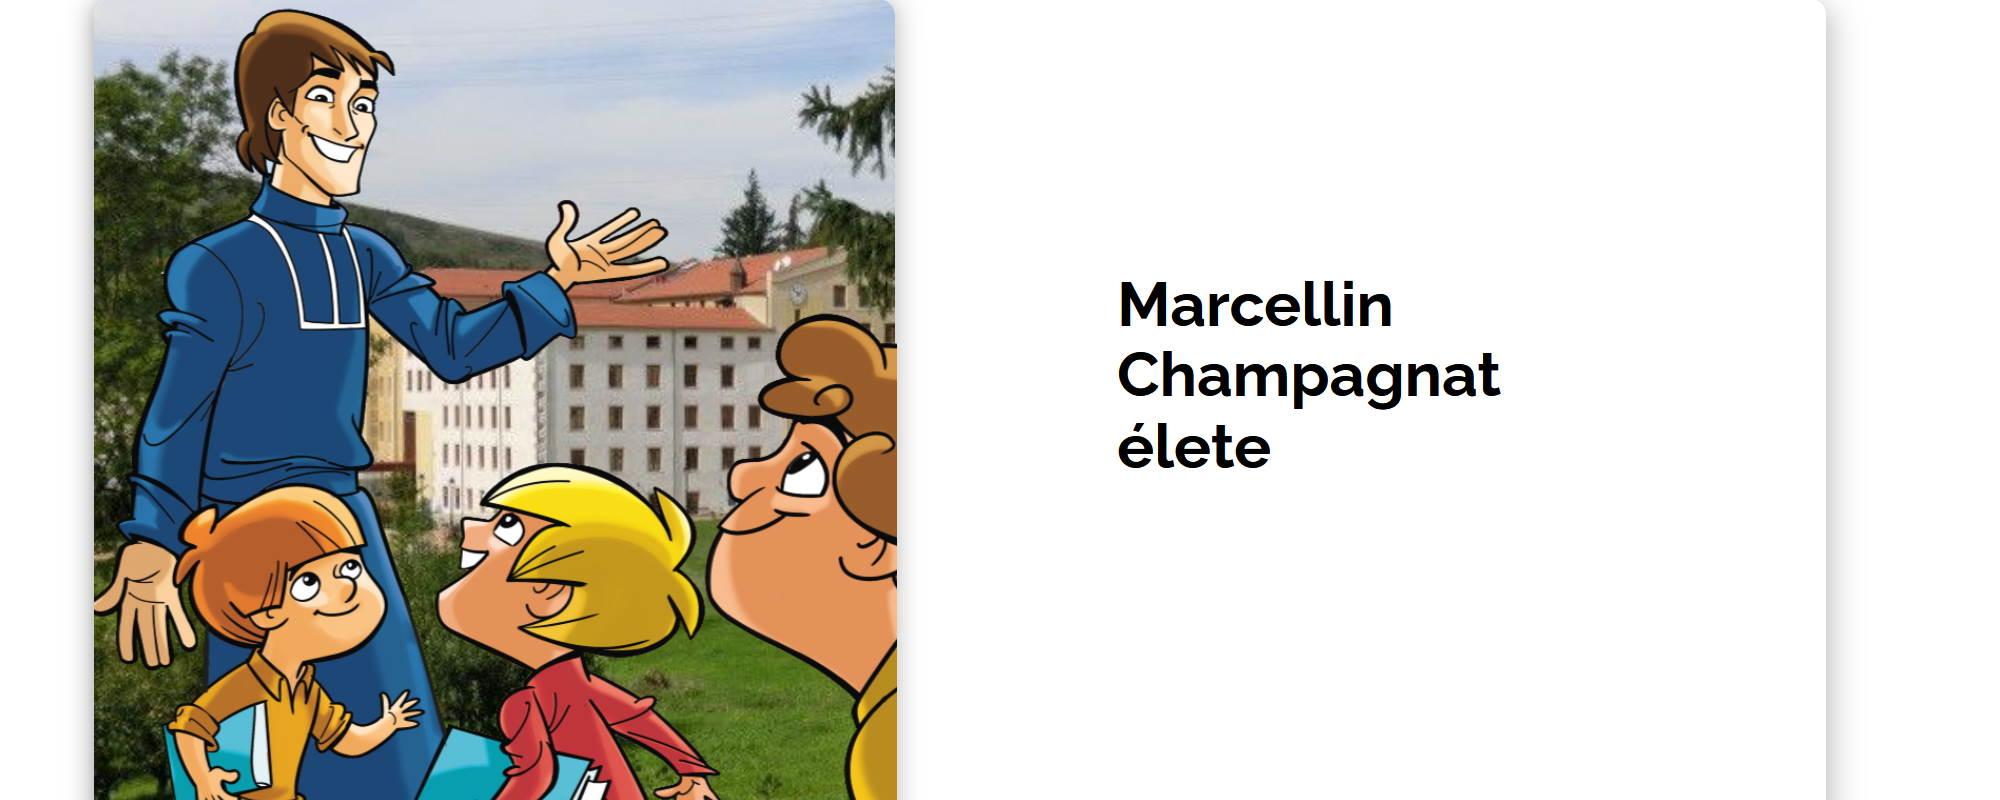 Szent Marcellin Champagnat napja